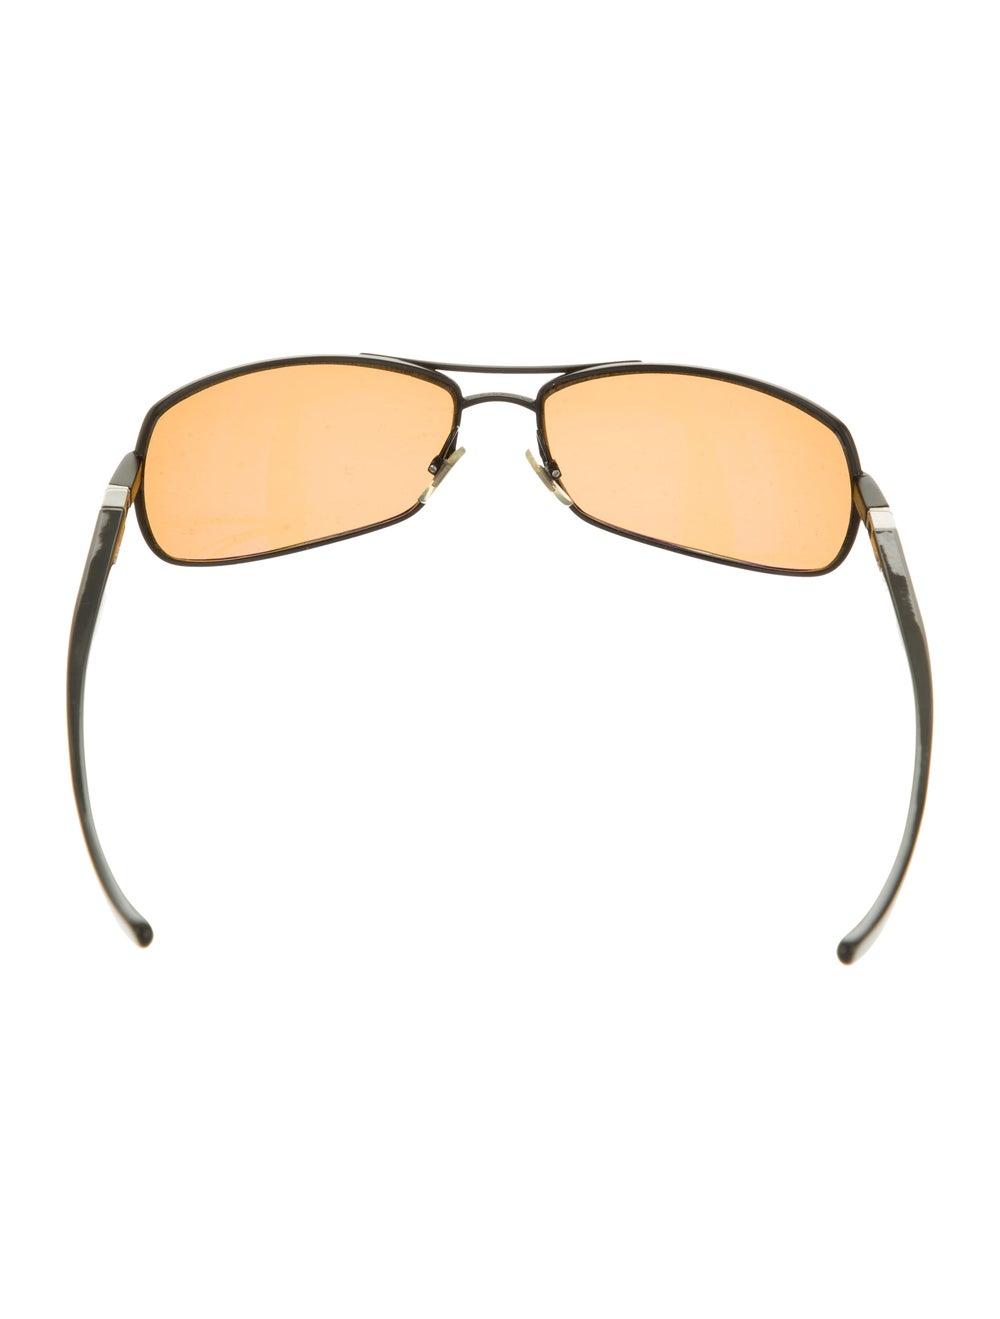 Alain Mikli Square Aviator Sunglasses brown - image 3